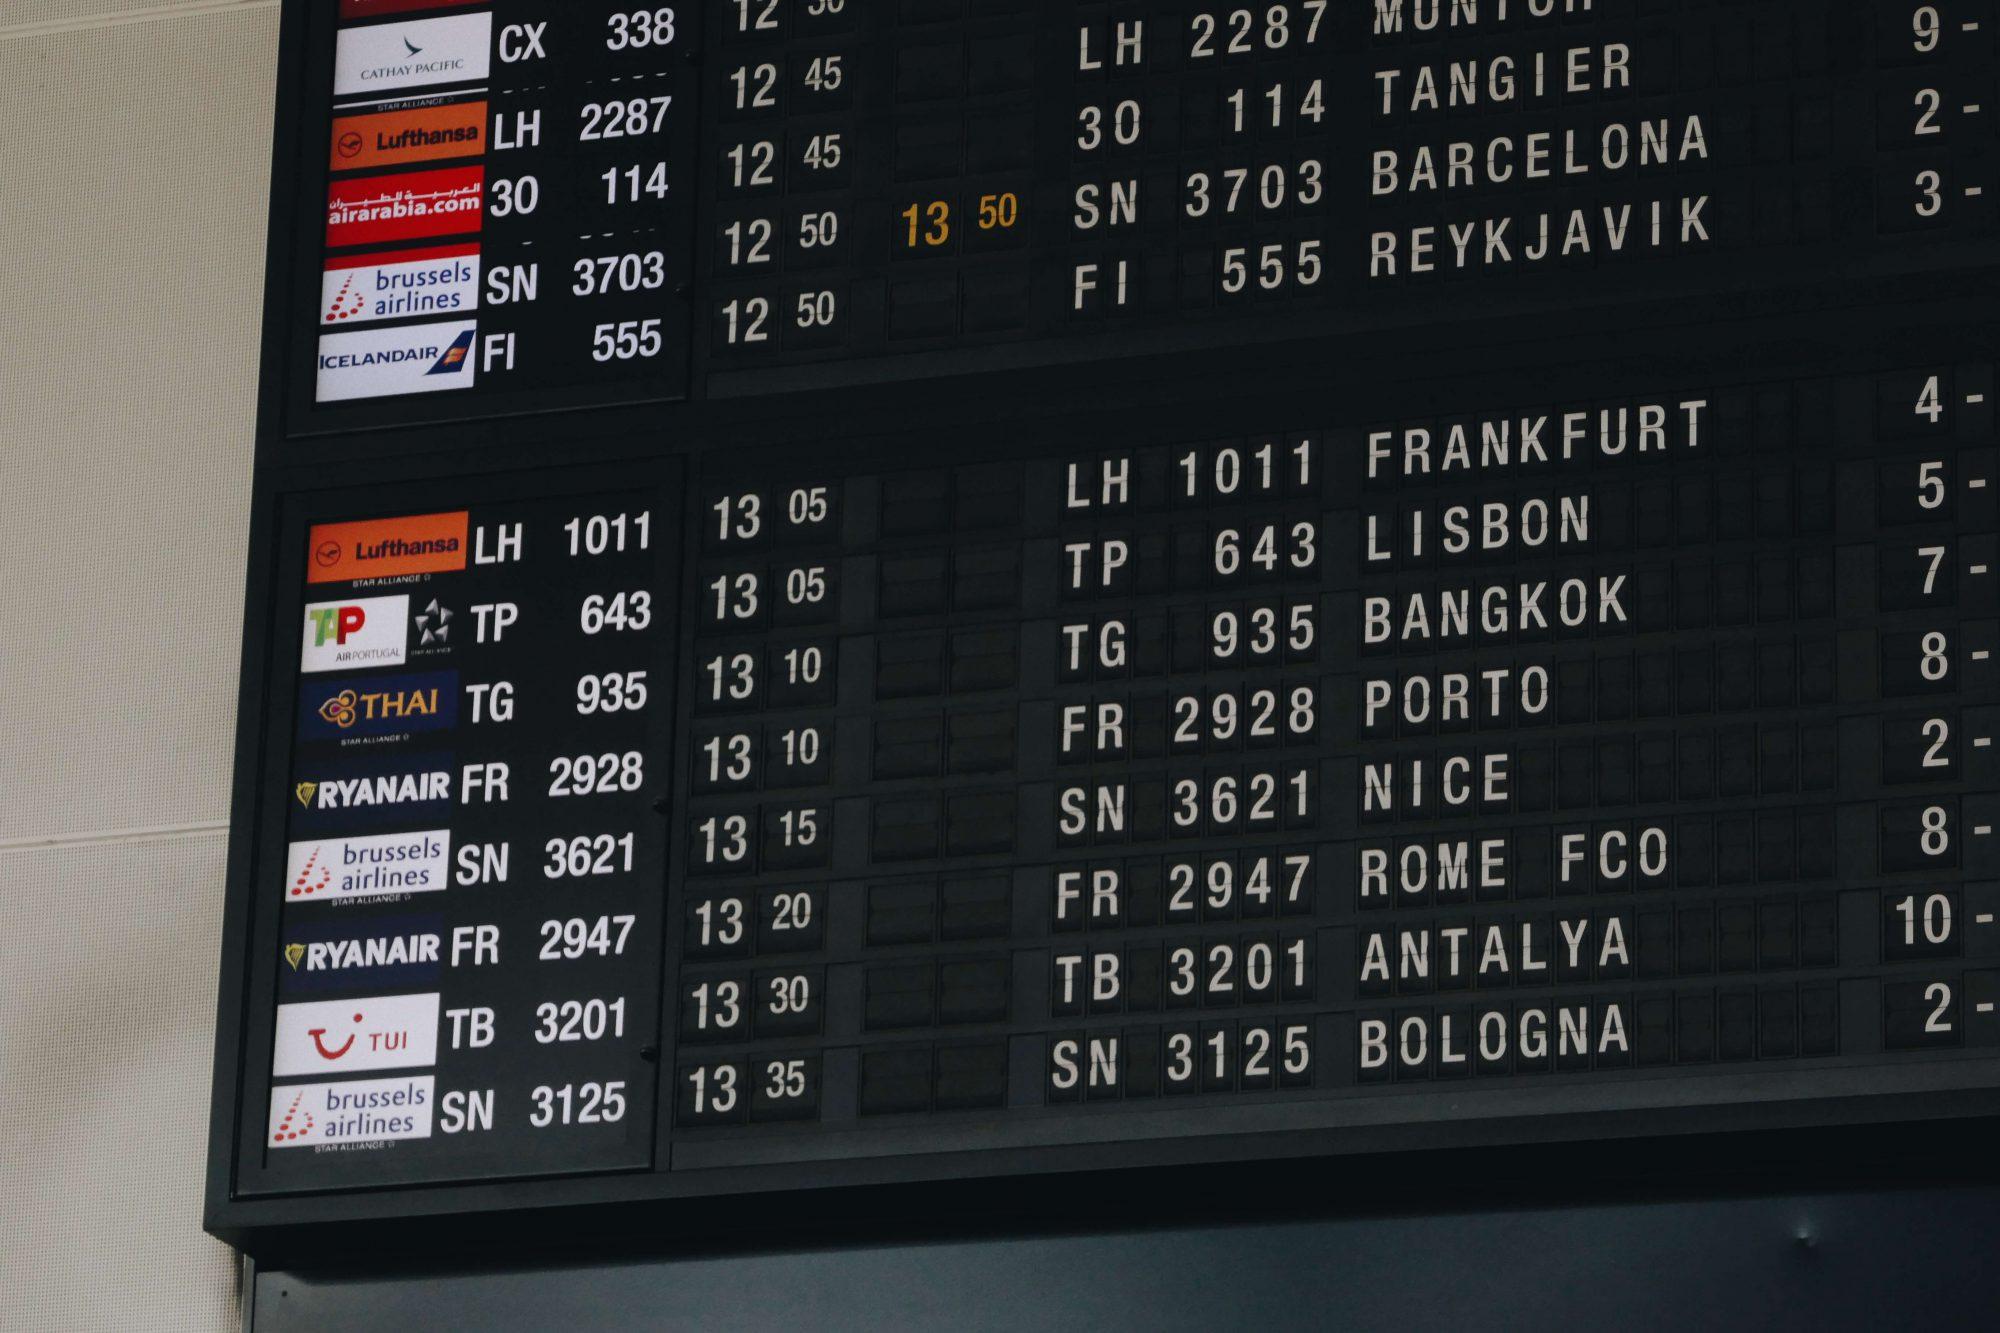 I FLY THAI TO BARCELONA, SPAIN